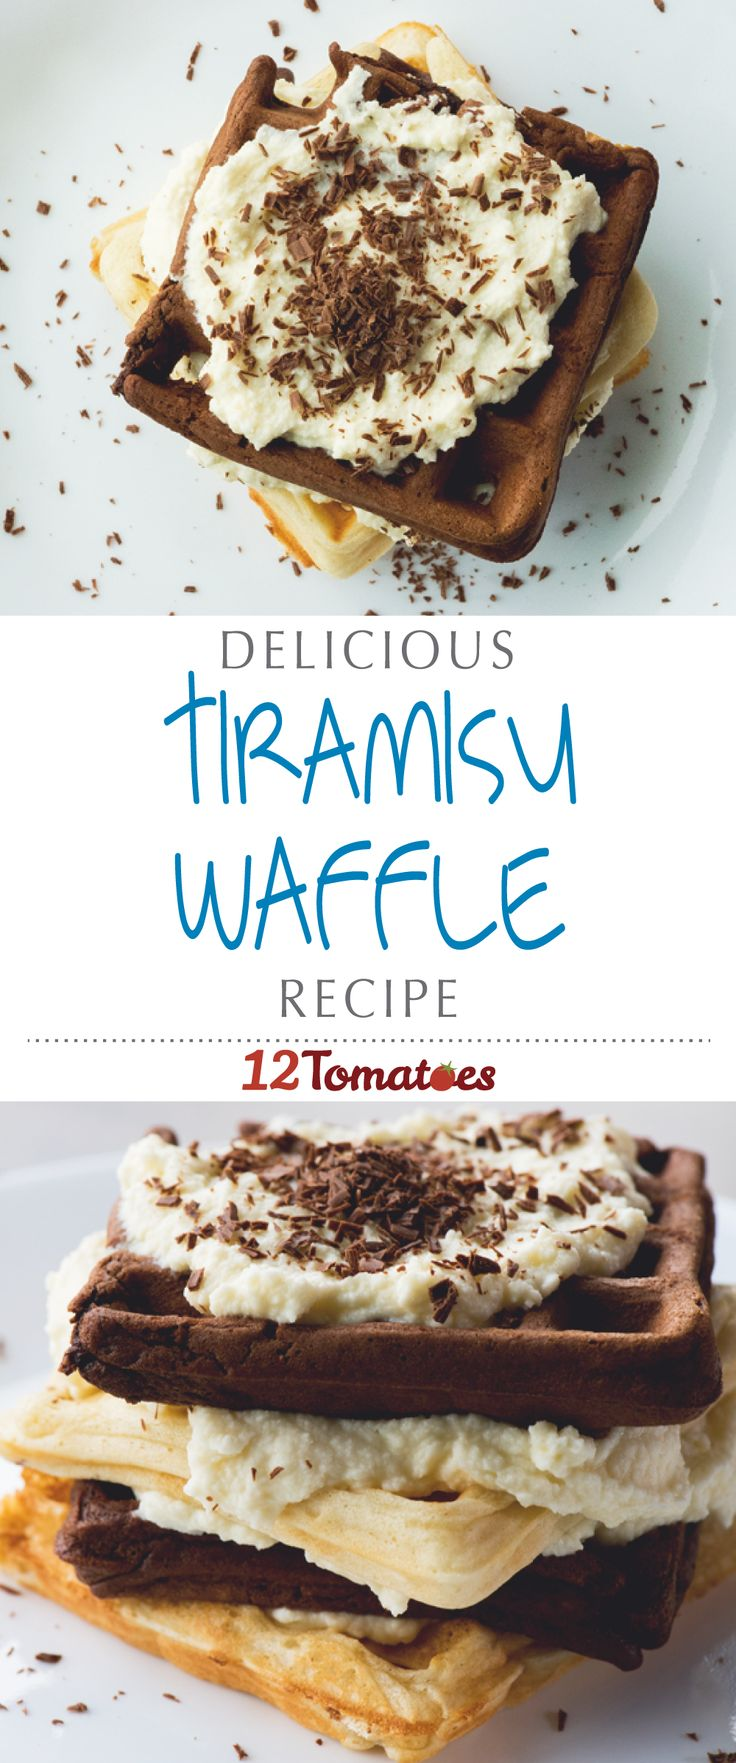 ... tiramisu cookies chocolate tiramisu tiramisu waffles tiramisu waffle